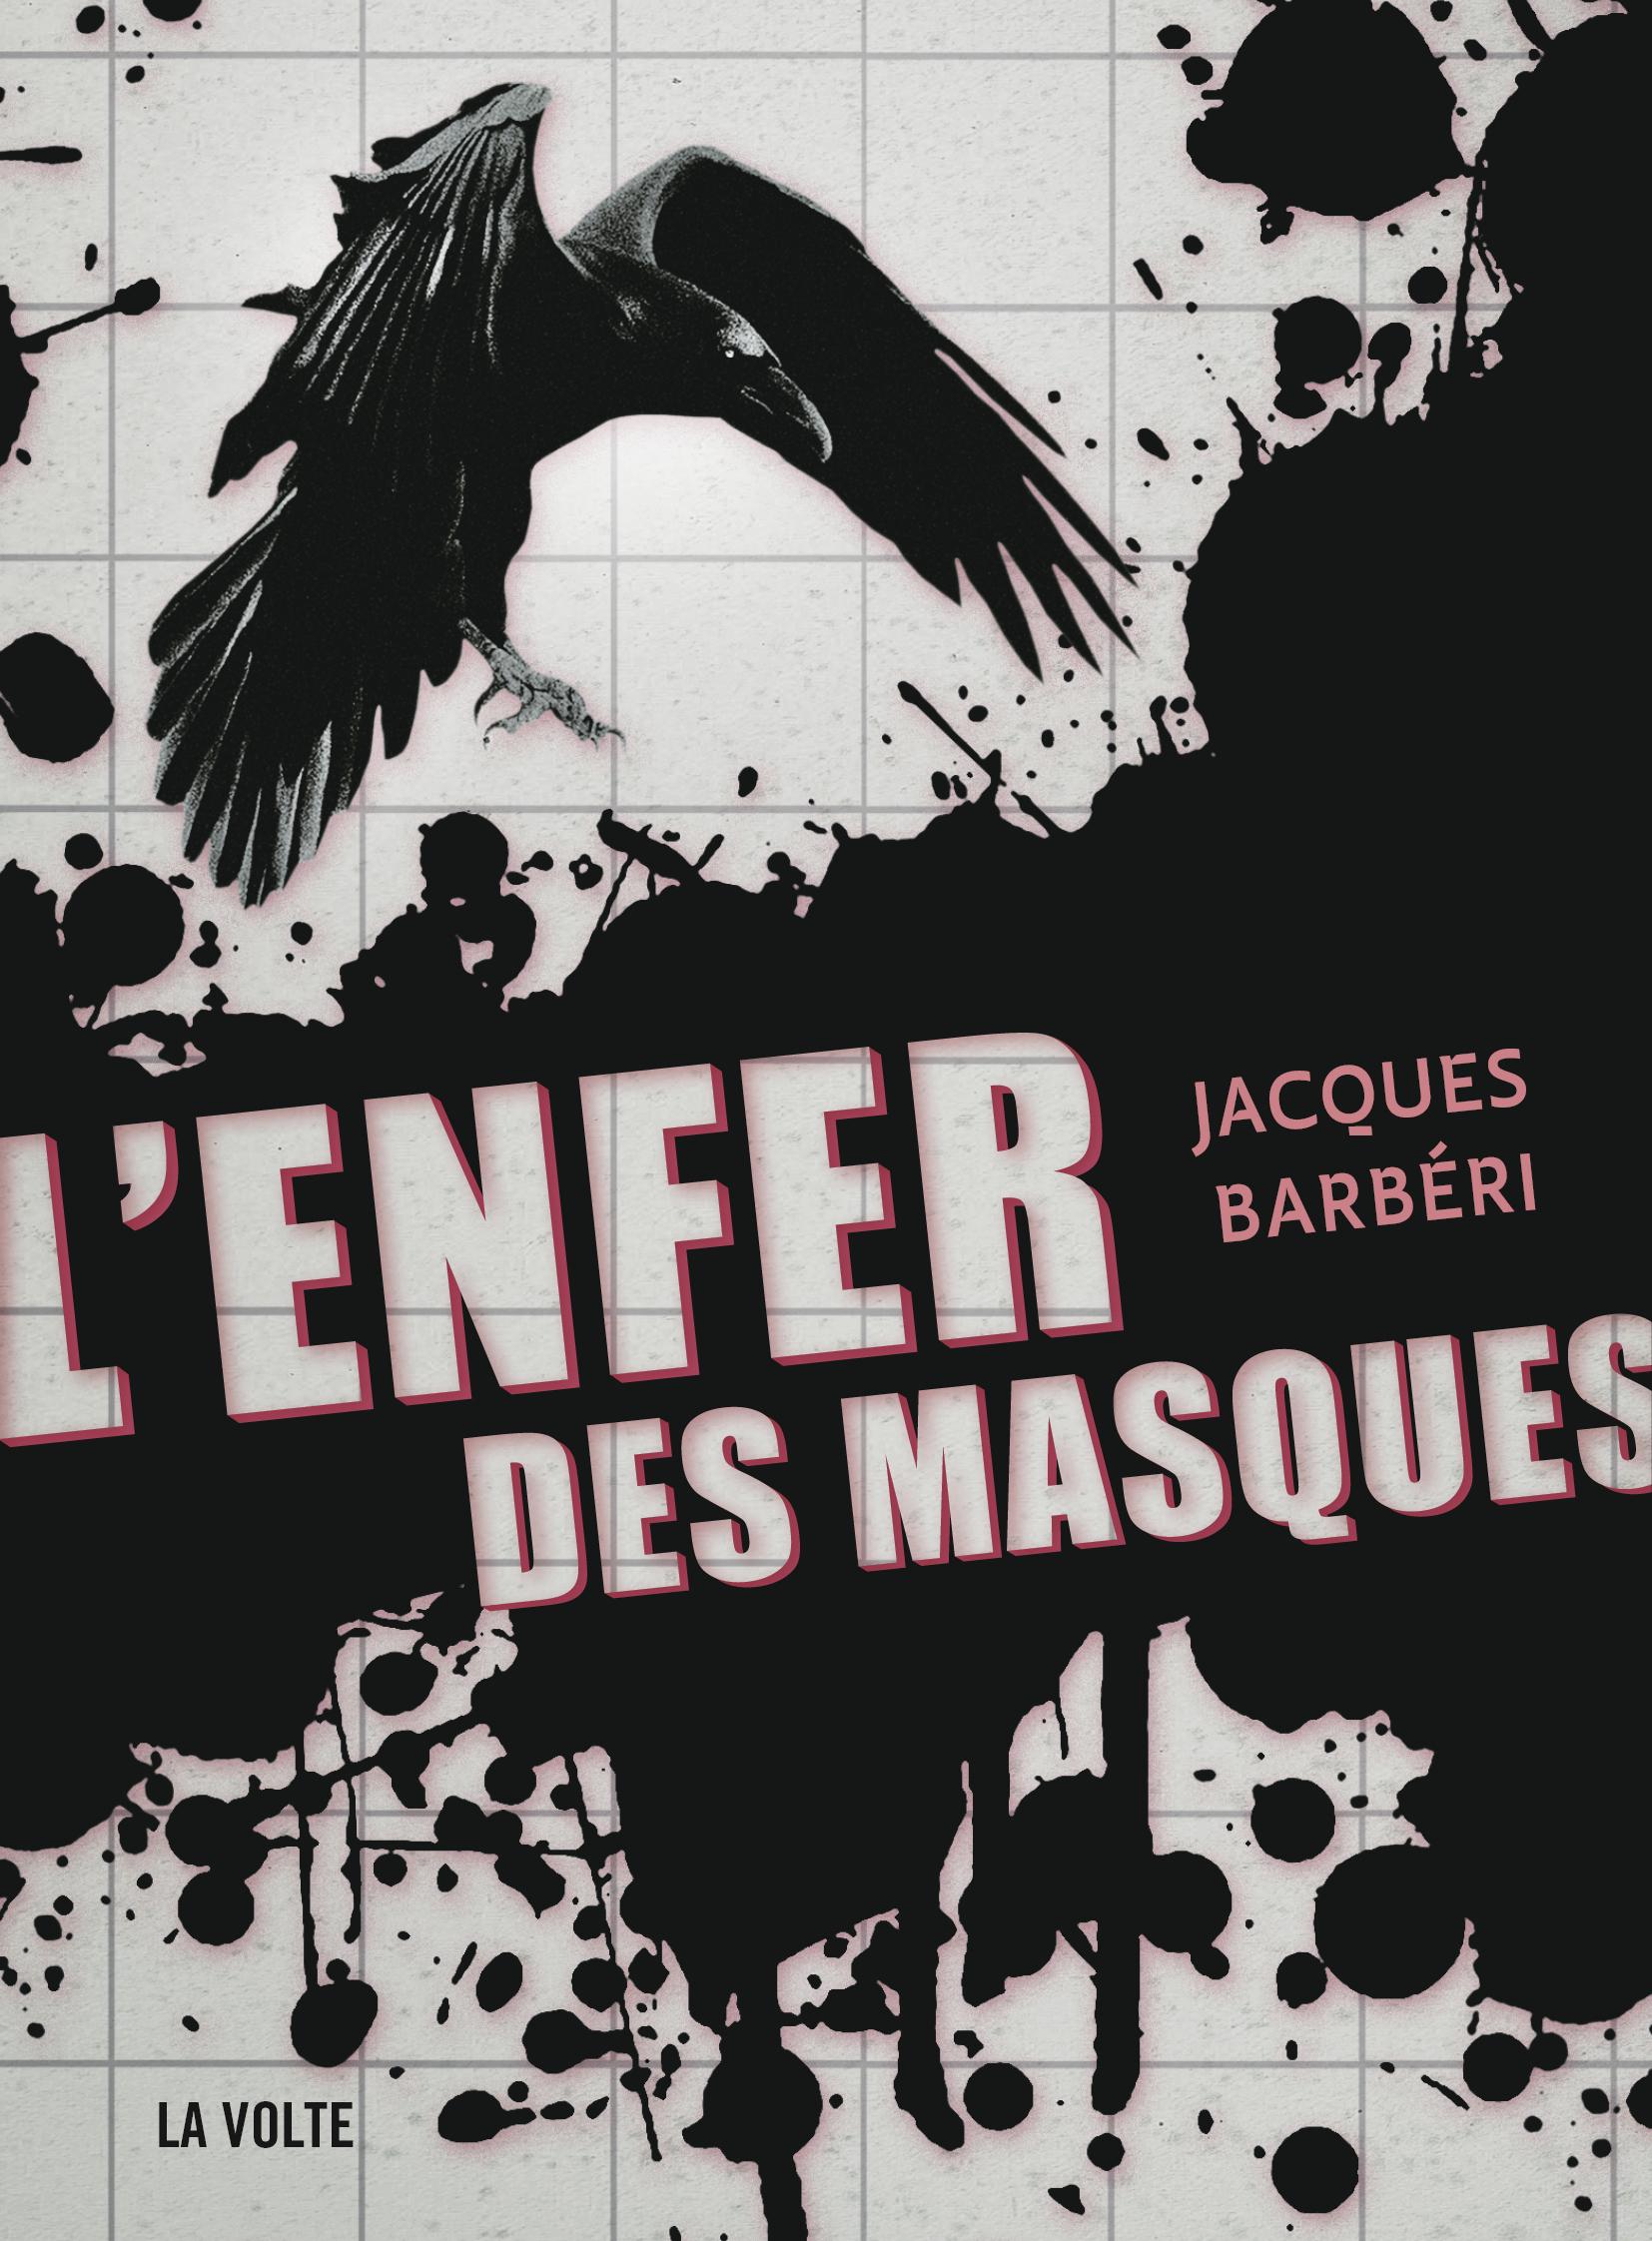 L'Enfer des masques